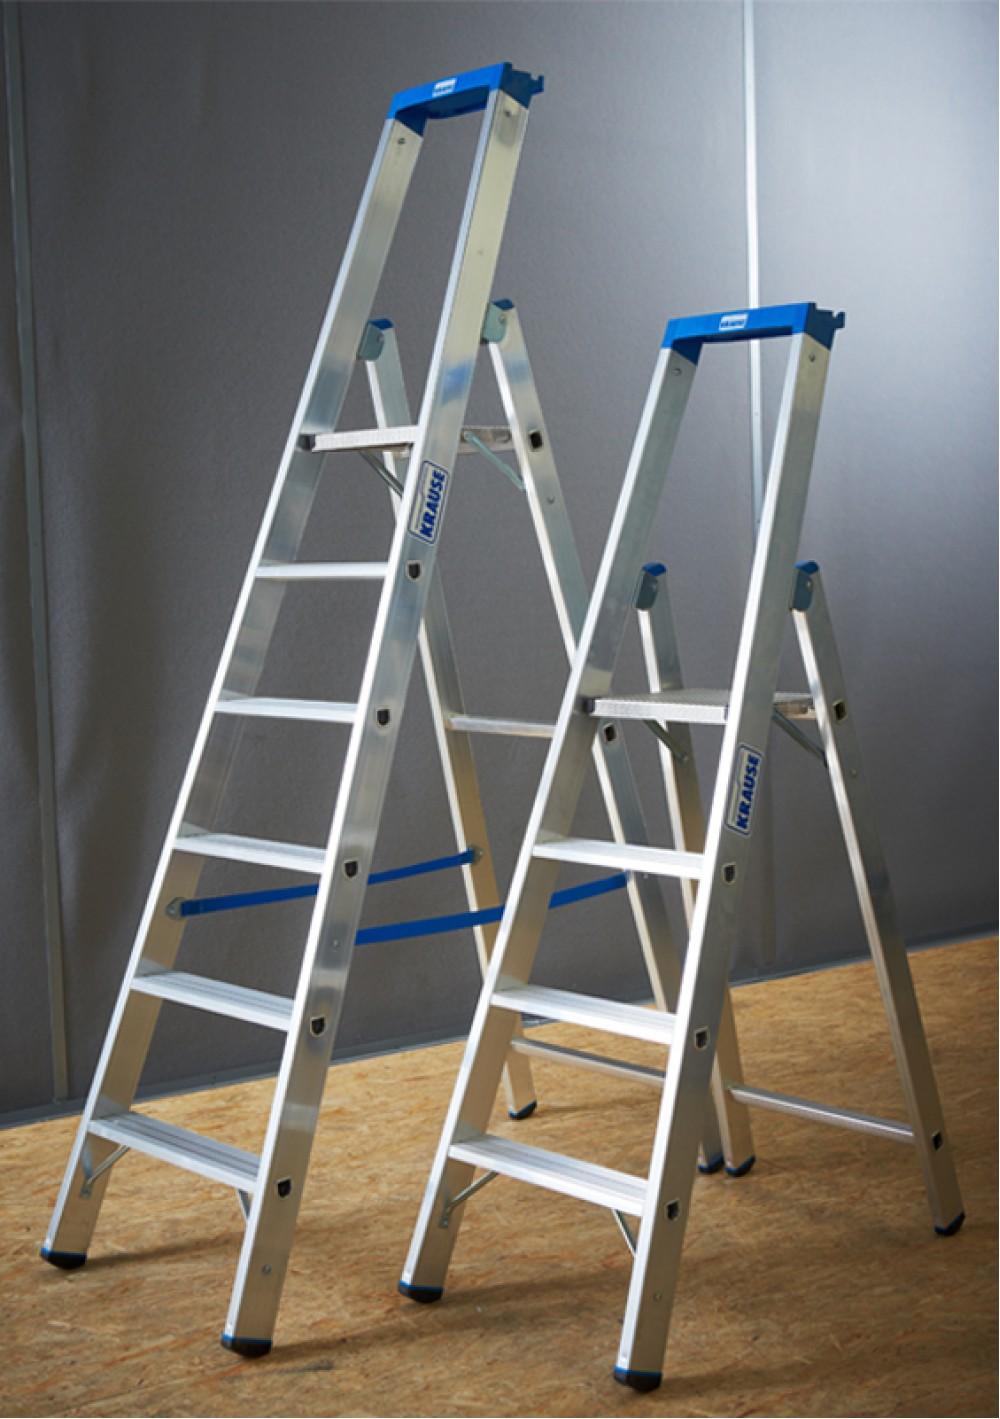 krause leiter profi stufen stehleiter 12 stufen. Black Bedroom Furniture Sets. Home Design Ideas